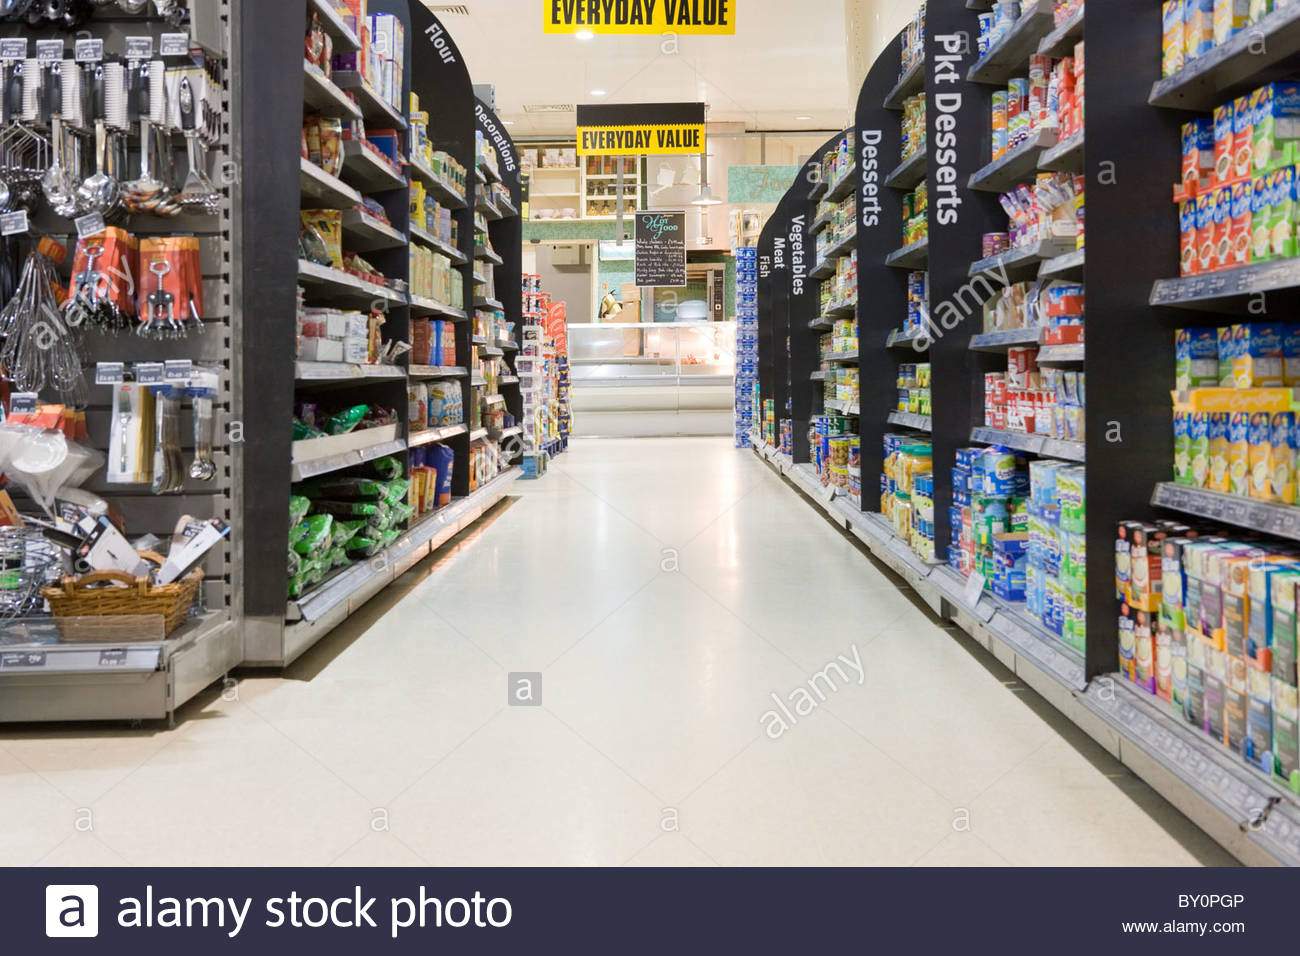 Supermarket Signs Aisle Stock Photos & Supermarket Signs